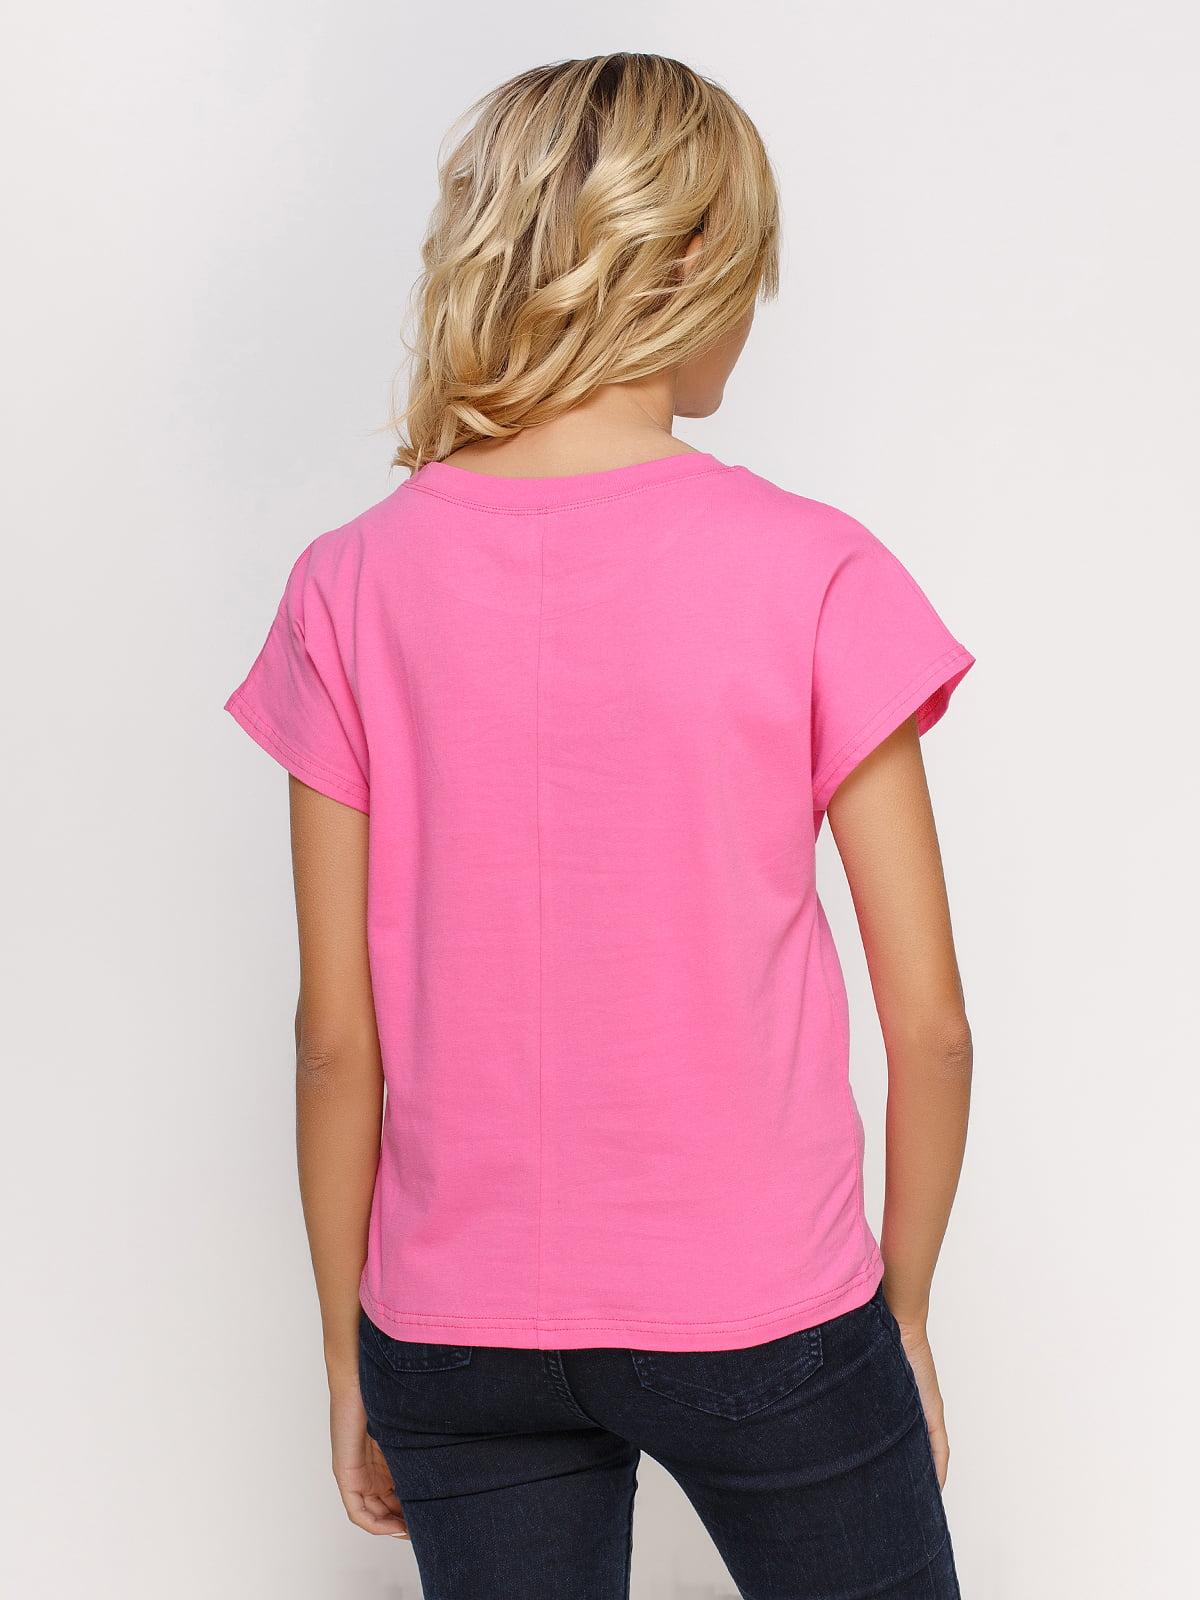 Футболка рожева з принтом | 4578220 | фото 2